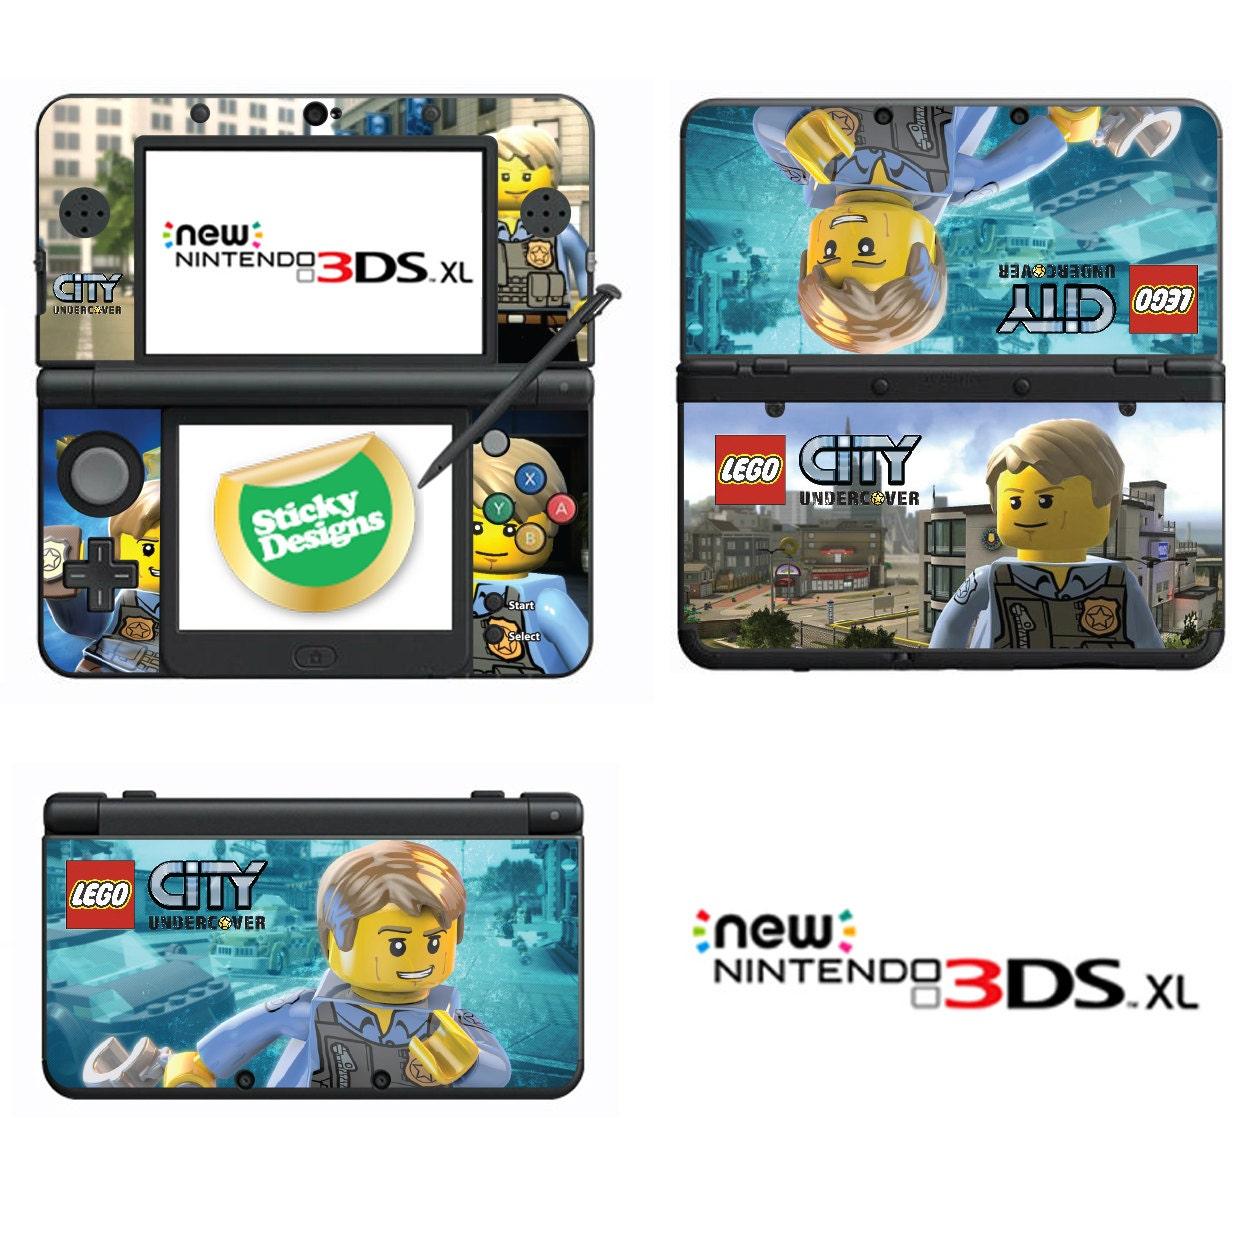 Lego City Undercover Vinyl Skin Sticker for Nintendo DS liteDSiDSi xl3DS3DS xlNew 3DS cstickNew 3DS xl cstick2DS